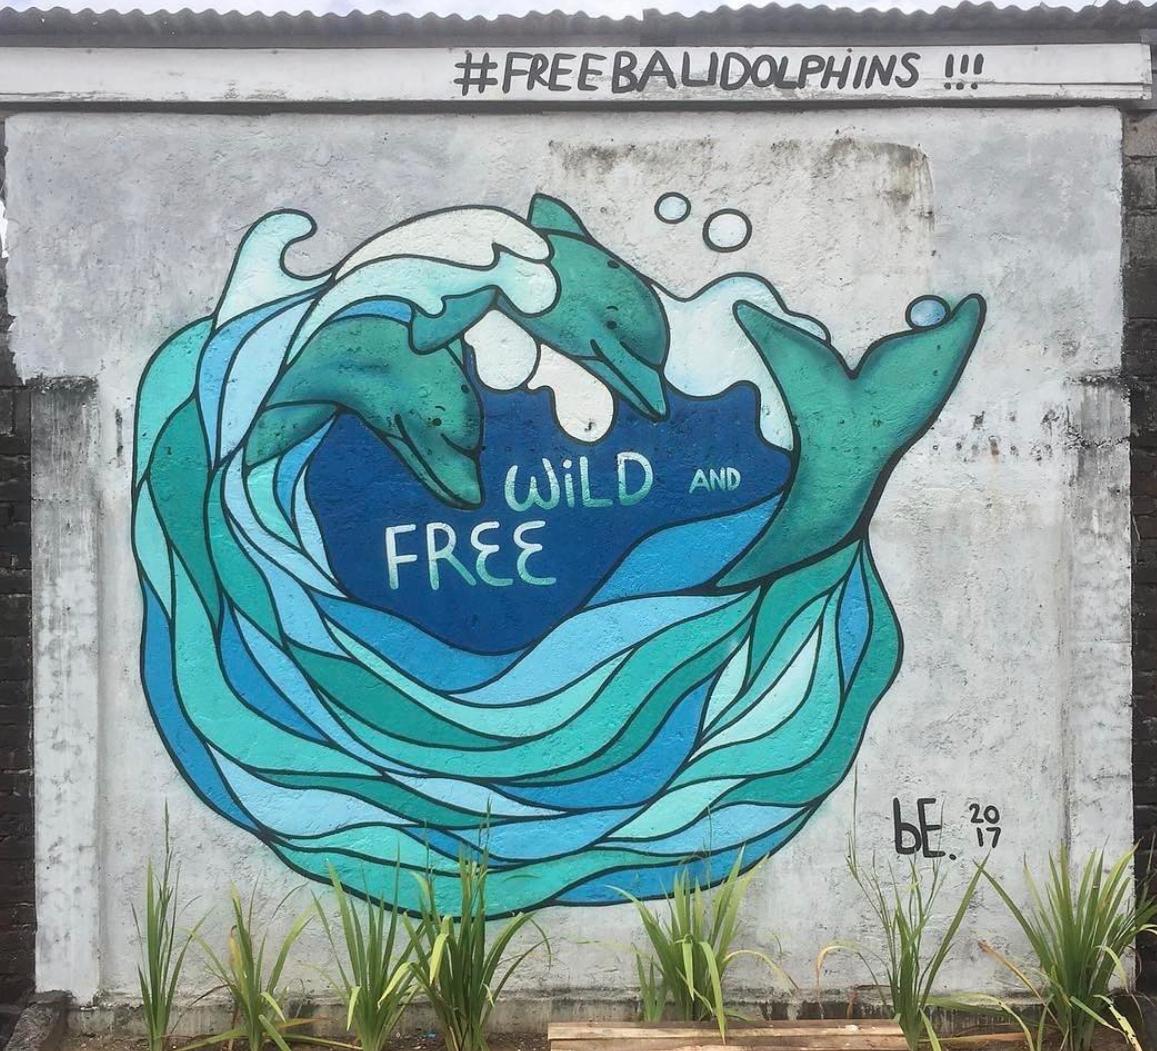 #FreeBaliDolphins Mural